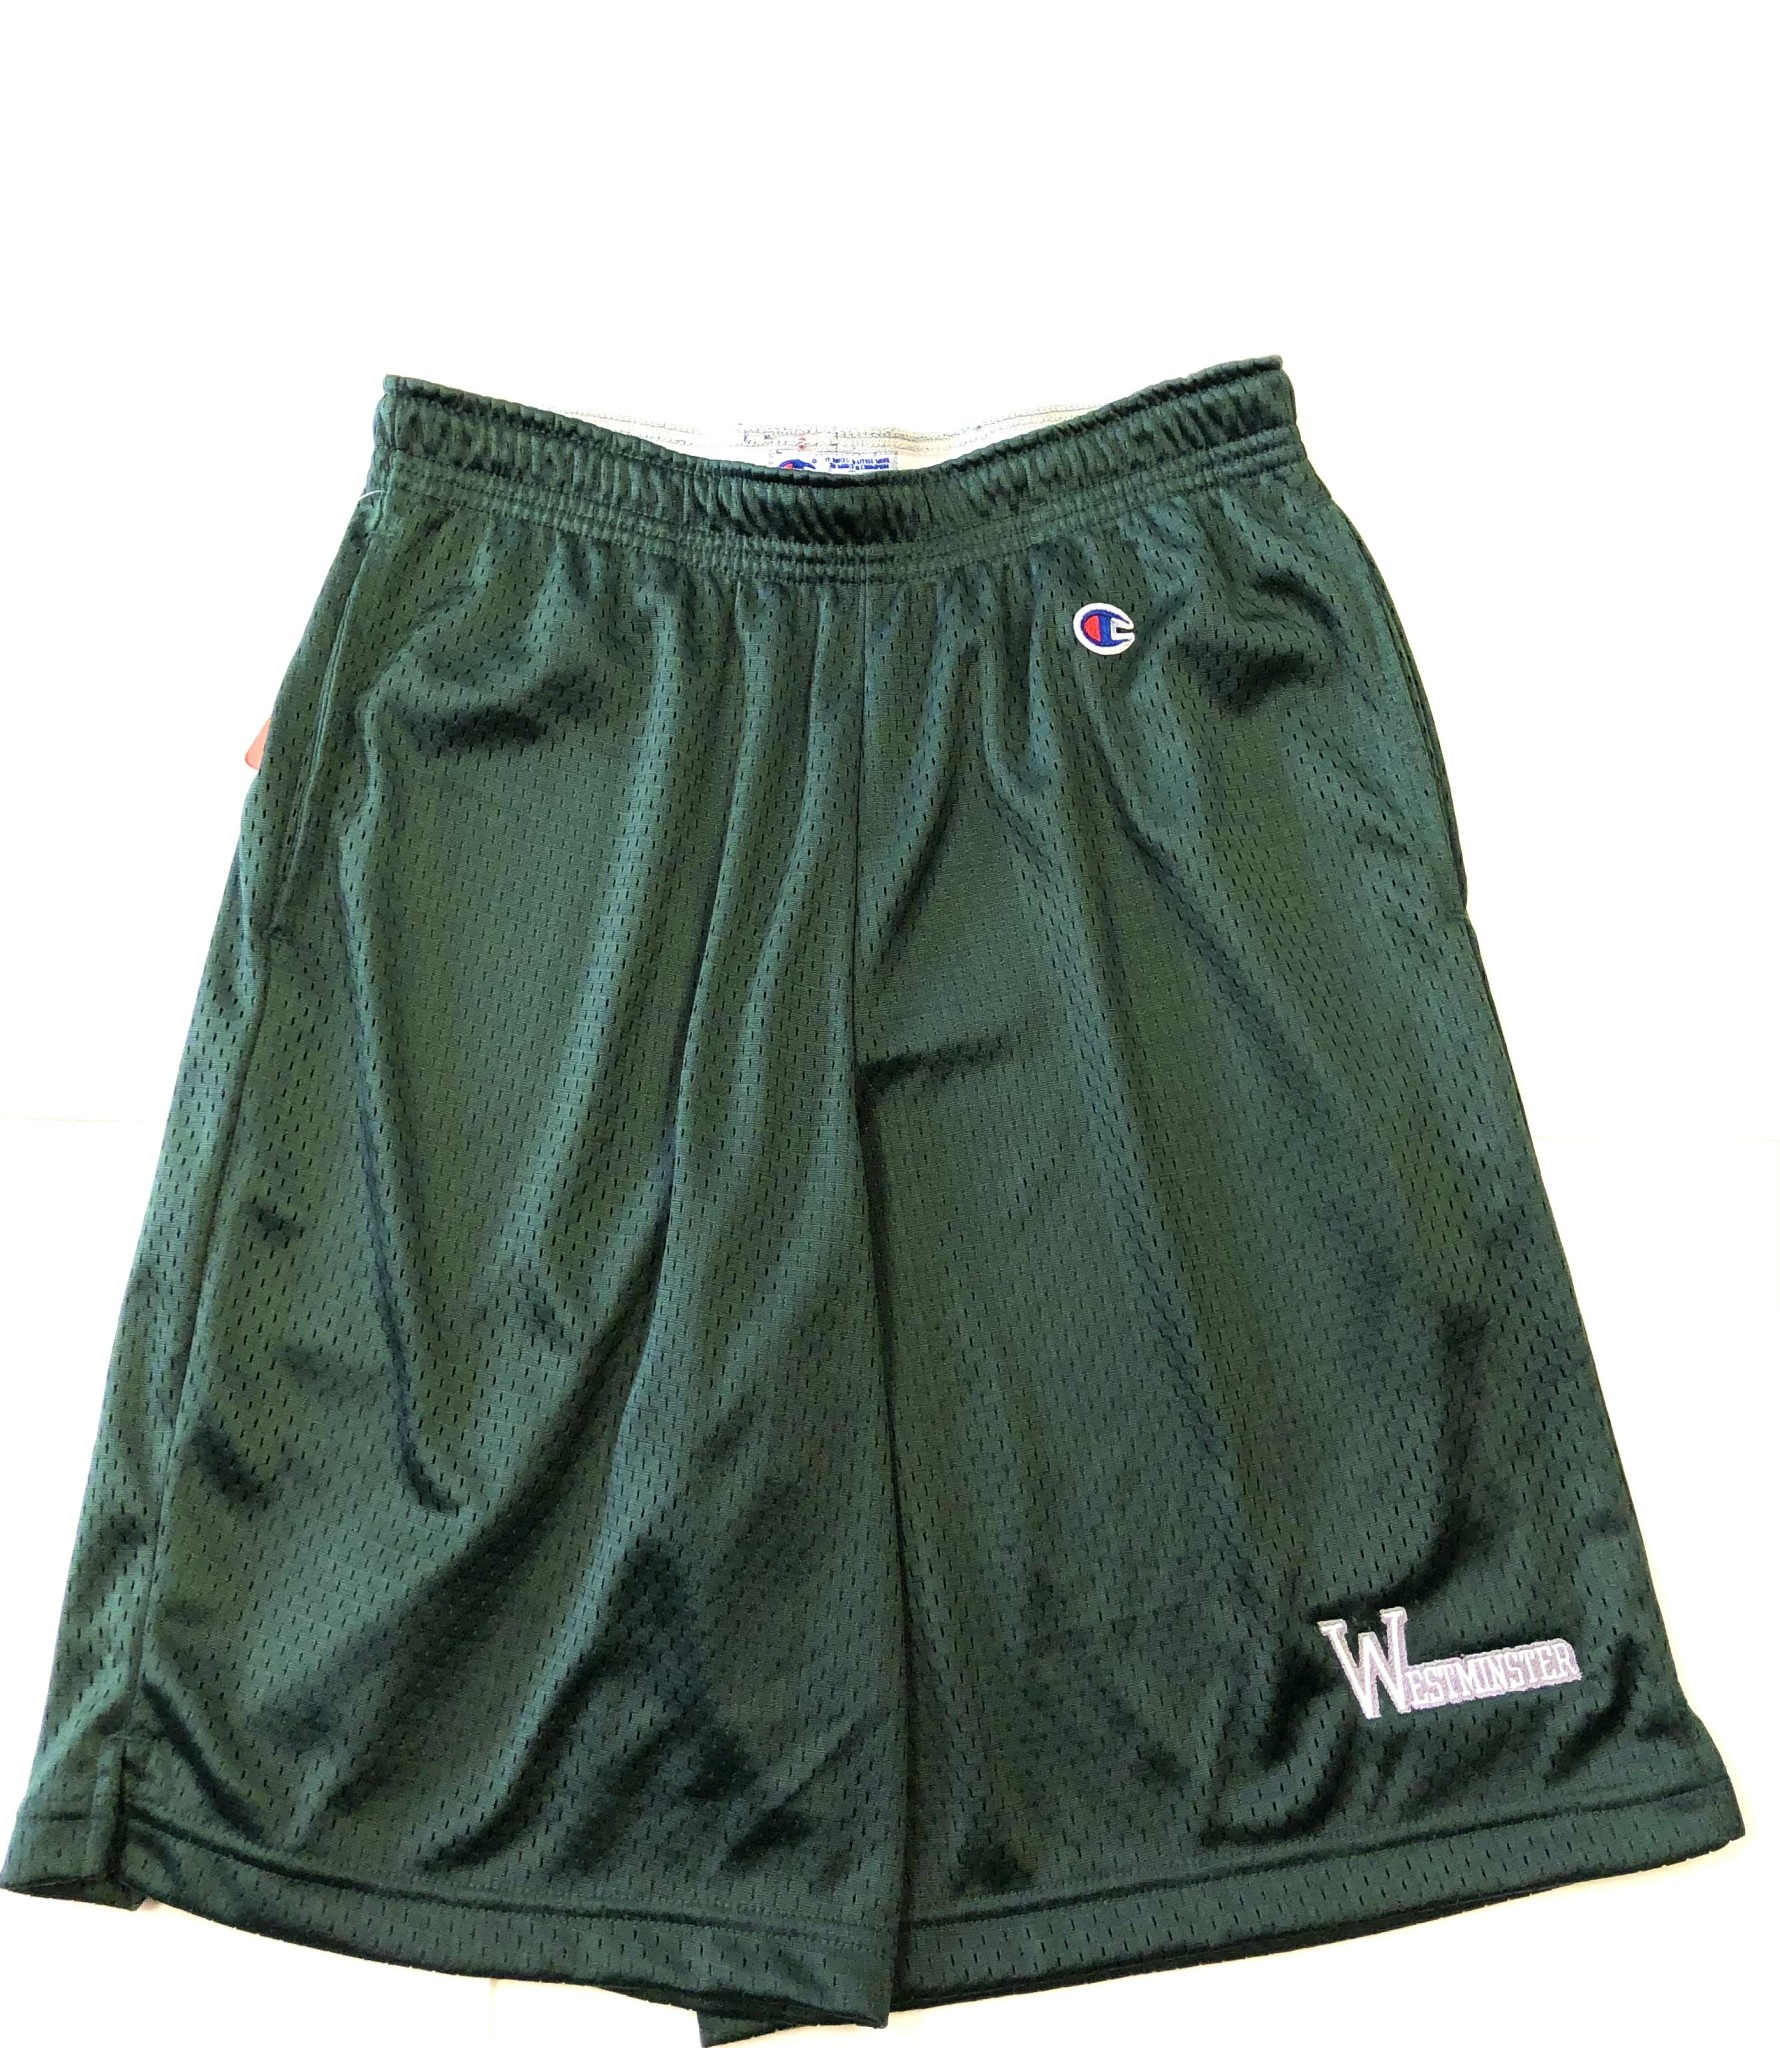 Champion Shorts: Champion Green Mesh